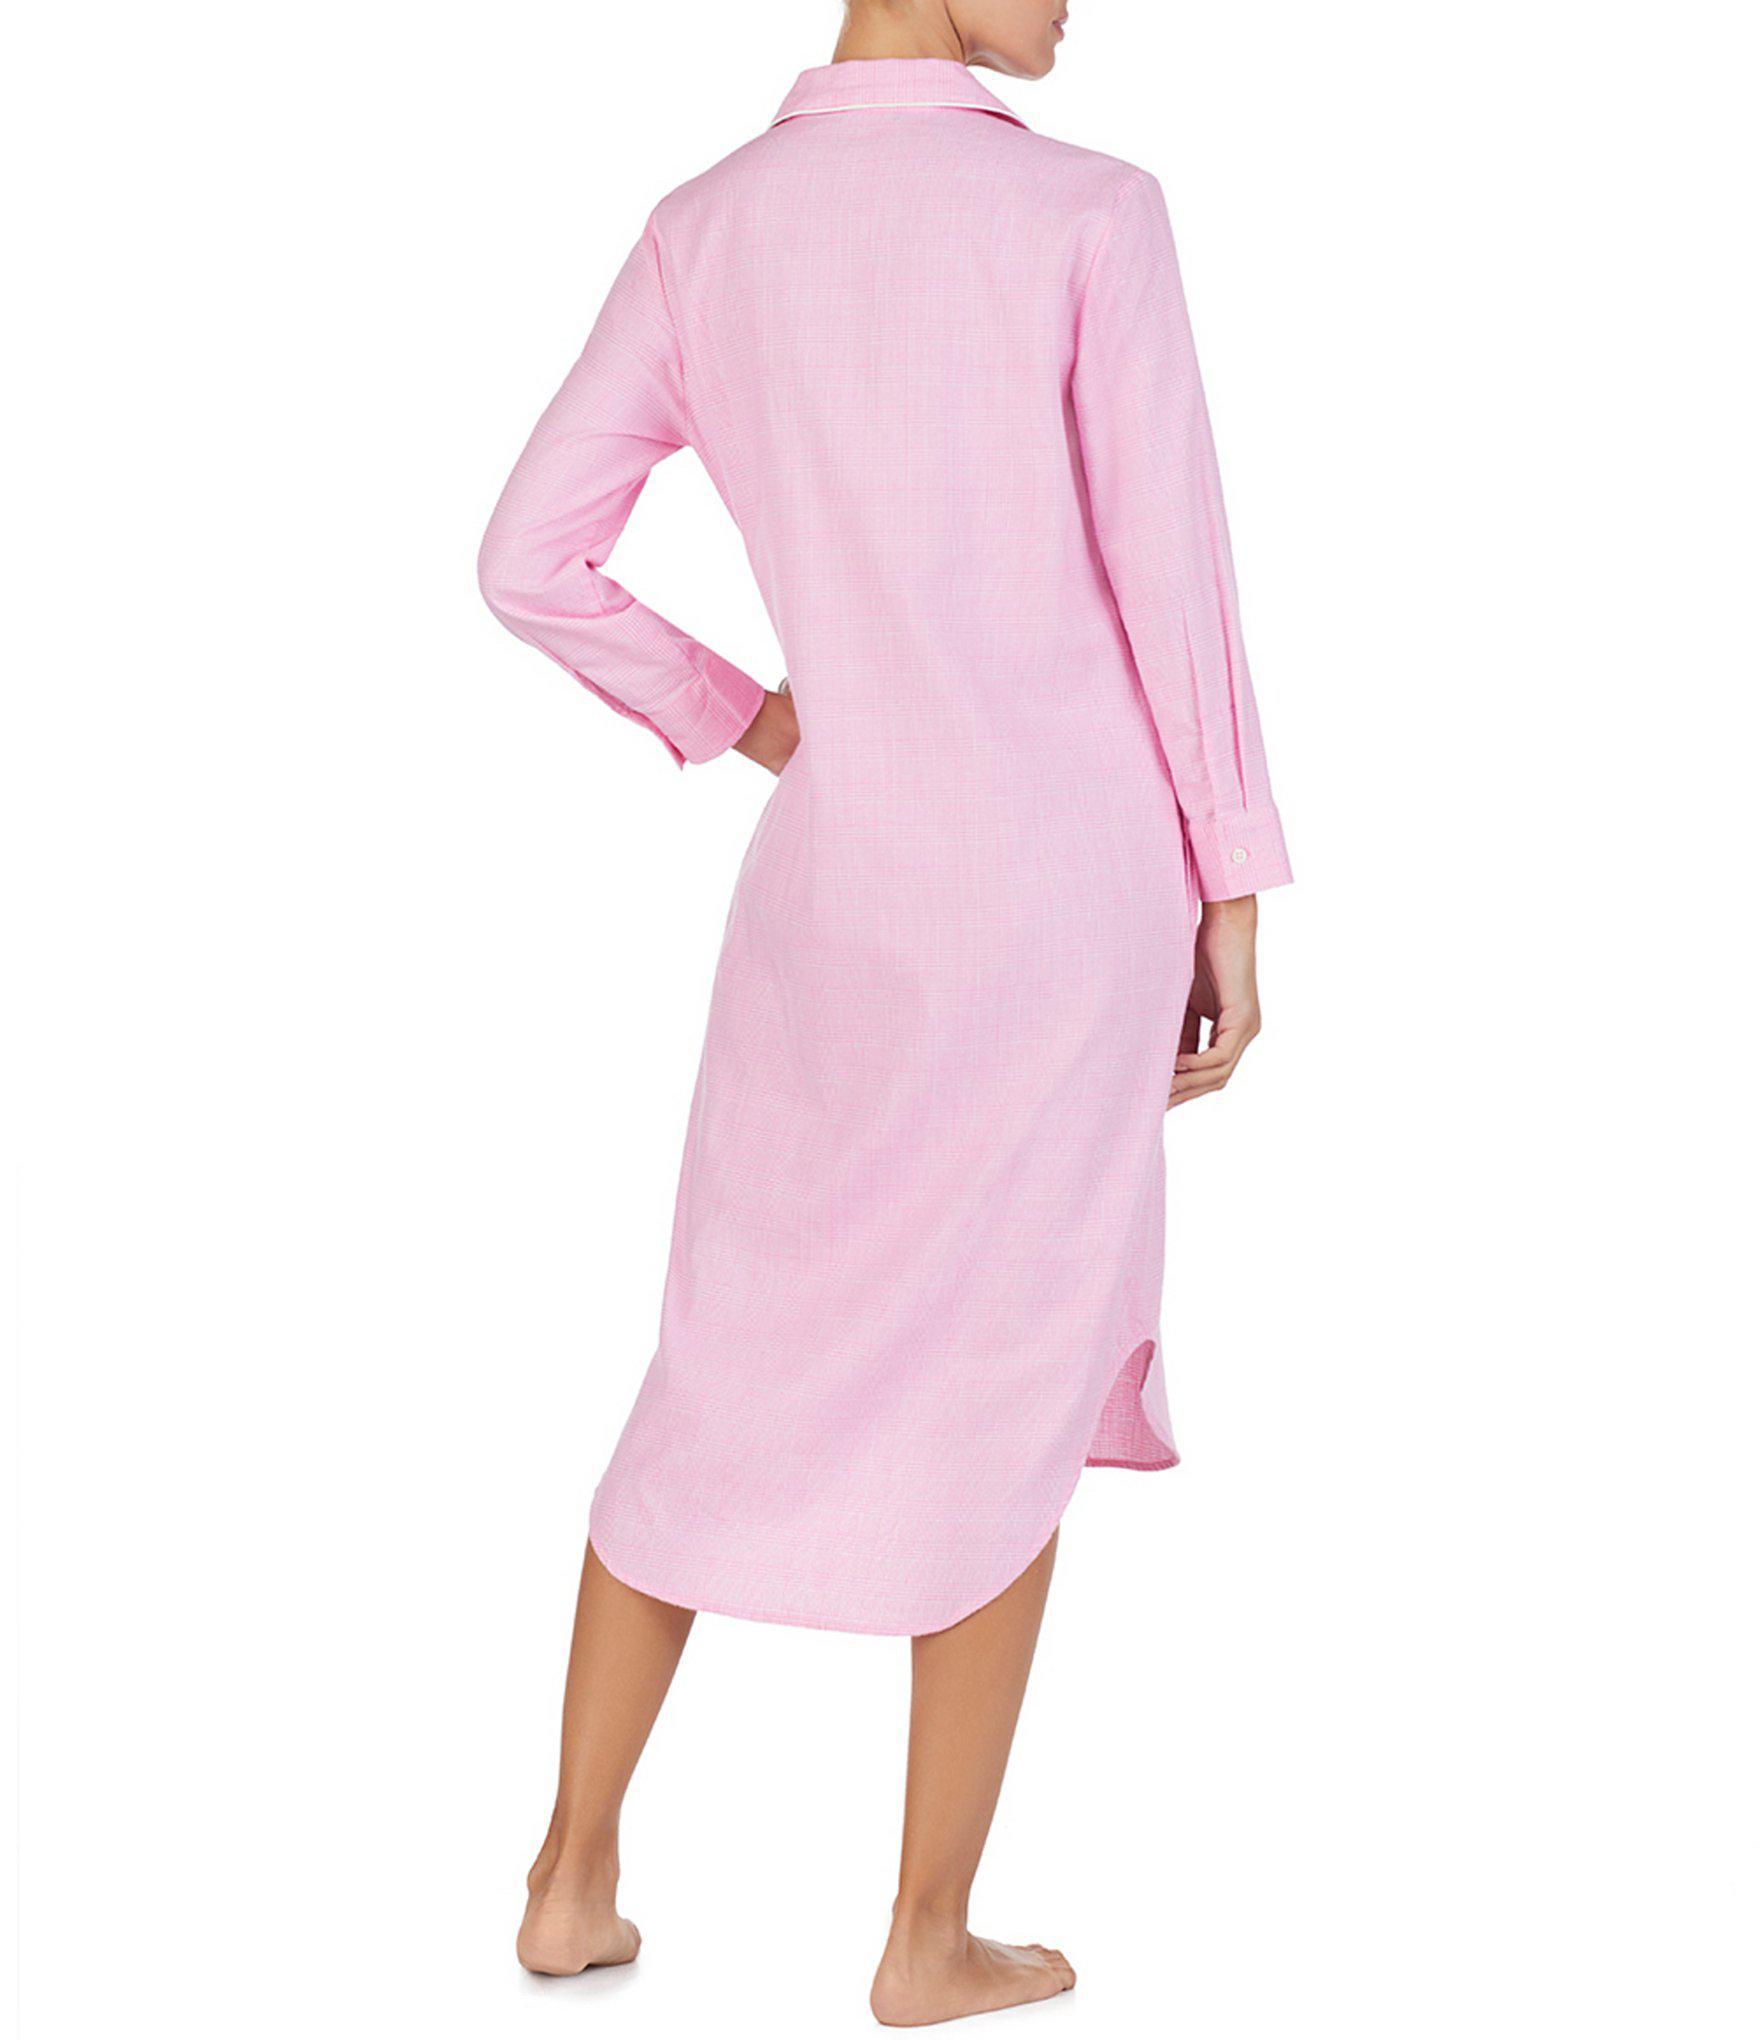 Lauren by Ralph Lauren - Pink Plaid Print Brushed Twill Maxi Sleep Shirt -  Lyst. View fullscreen 5238b83ee